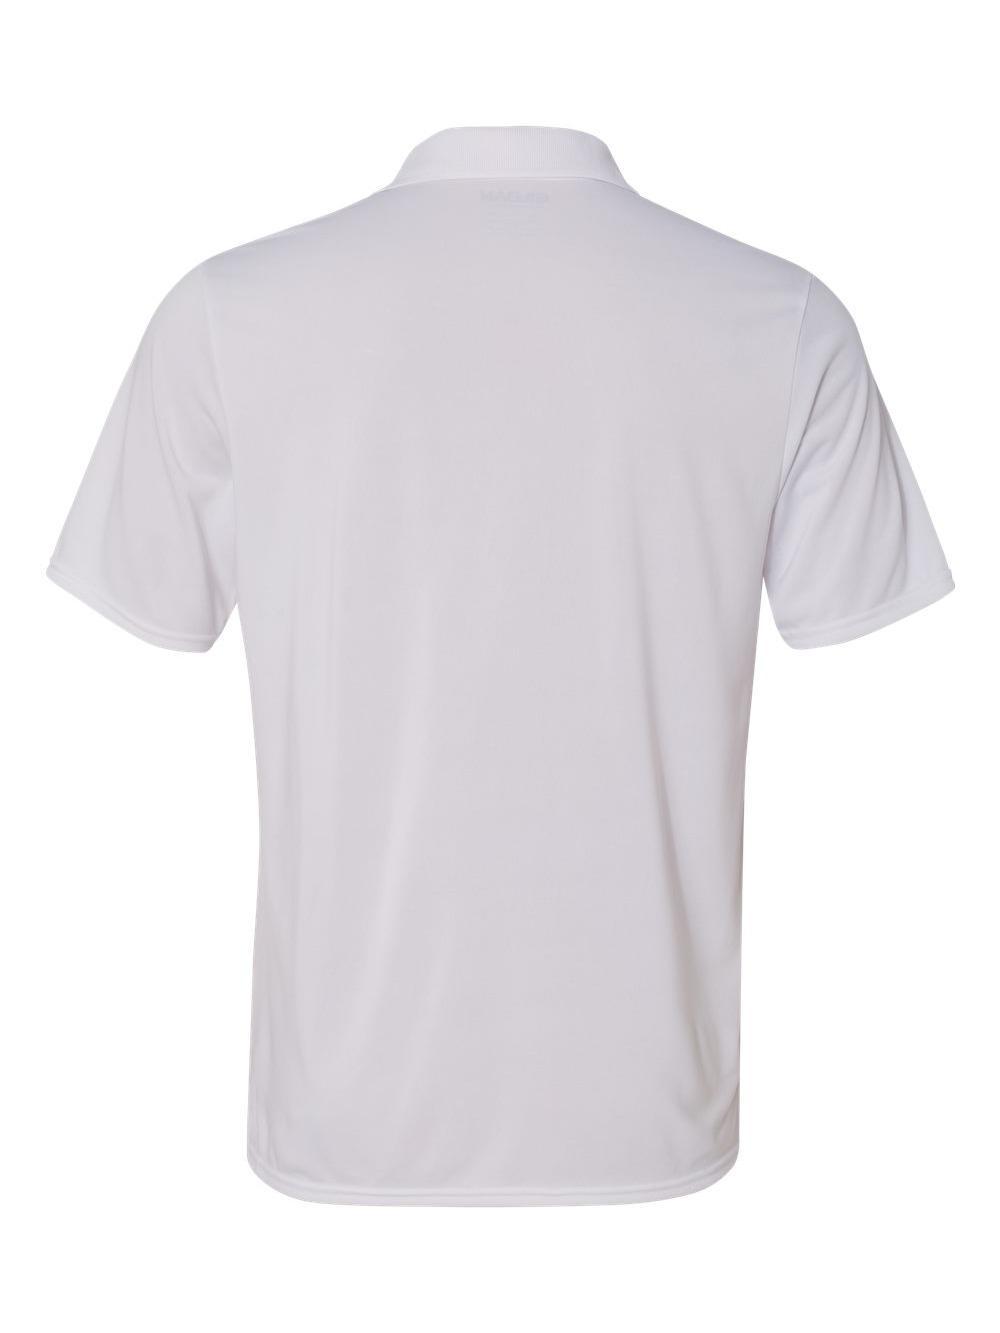 Gildan-Performance-Jersey-Sport-Shirt-44800 thumbnail 25